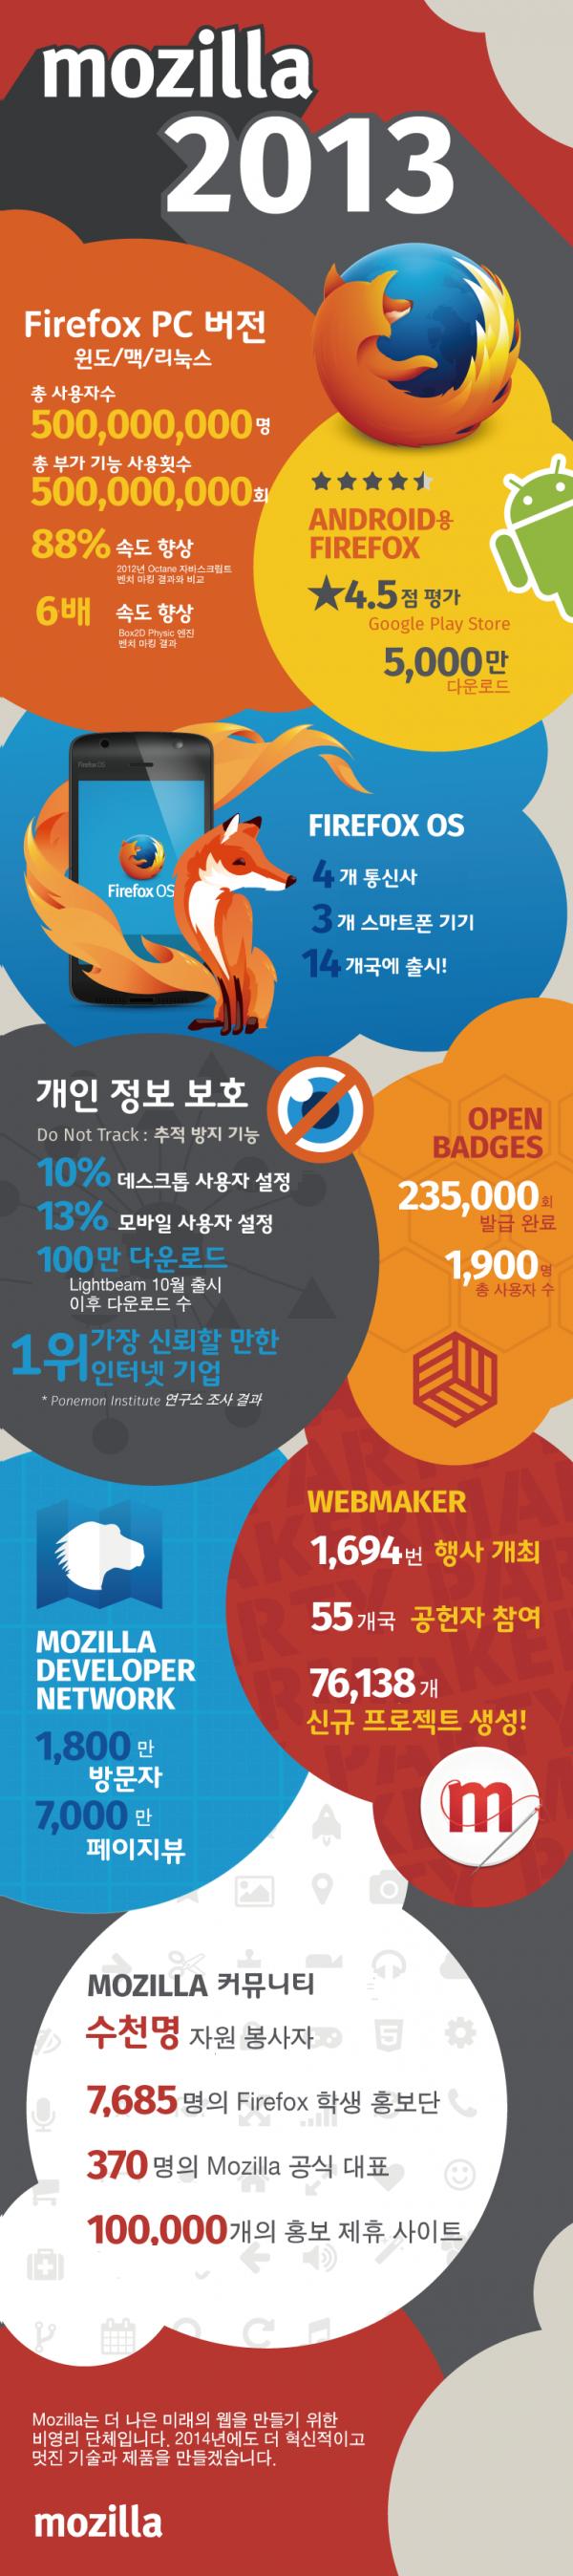 mozilla-2013-infographic